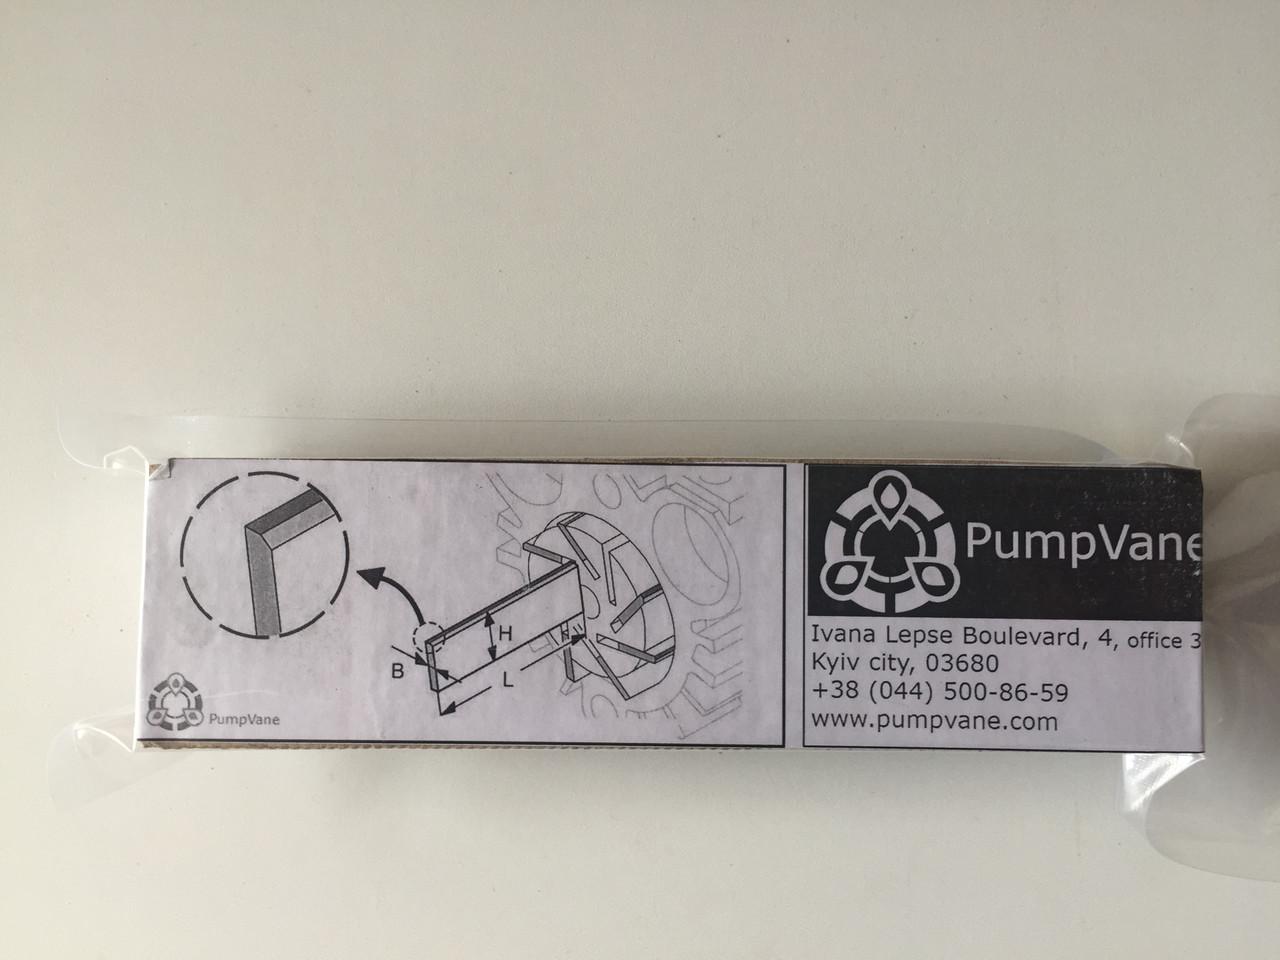 55 х 25 х 4 мм Лопатка графитовая для вакуумного насоса Busch SD/SV 1006 B 722000065